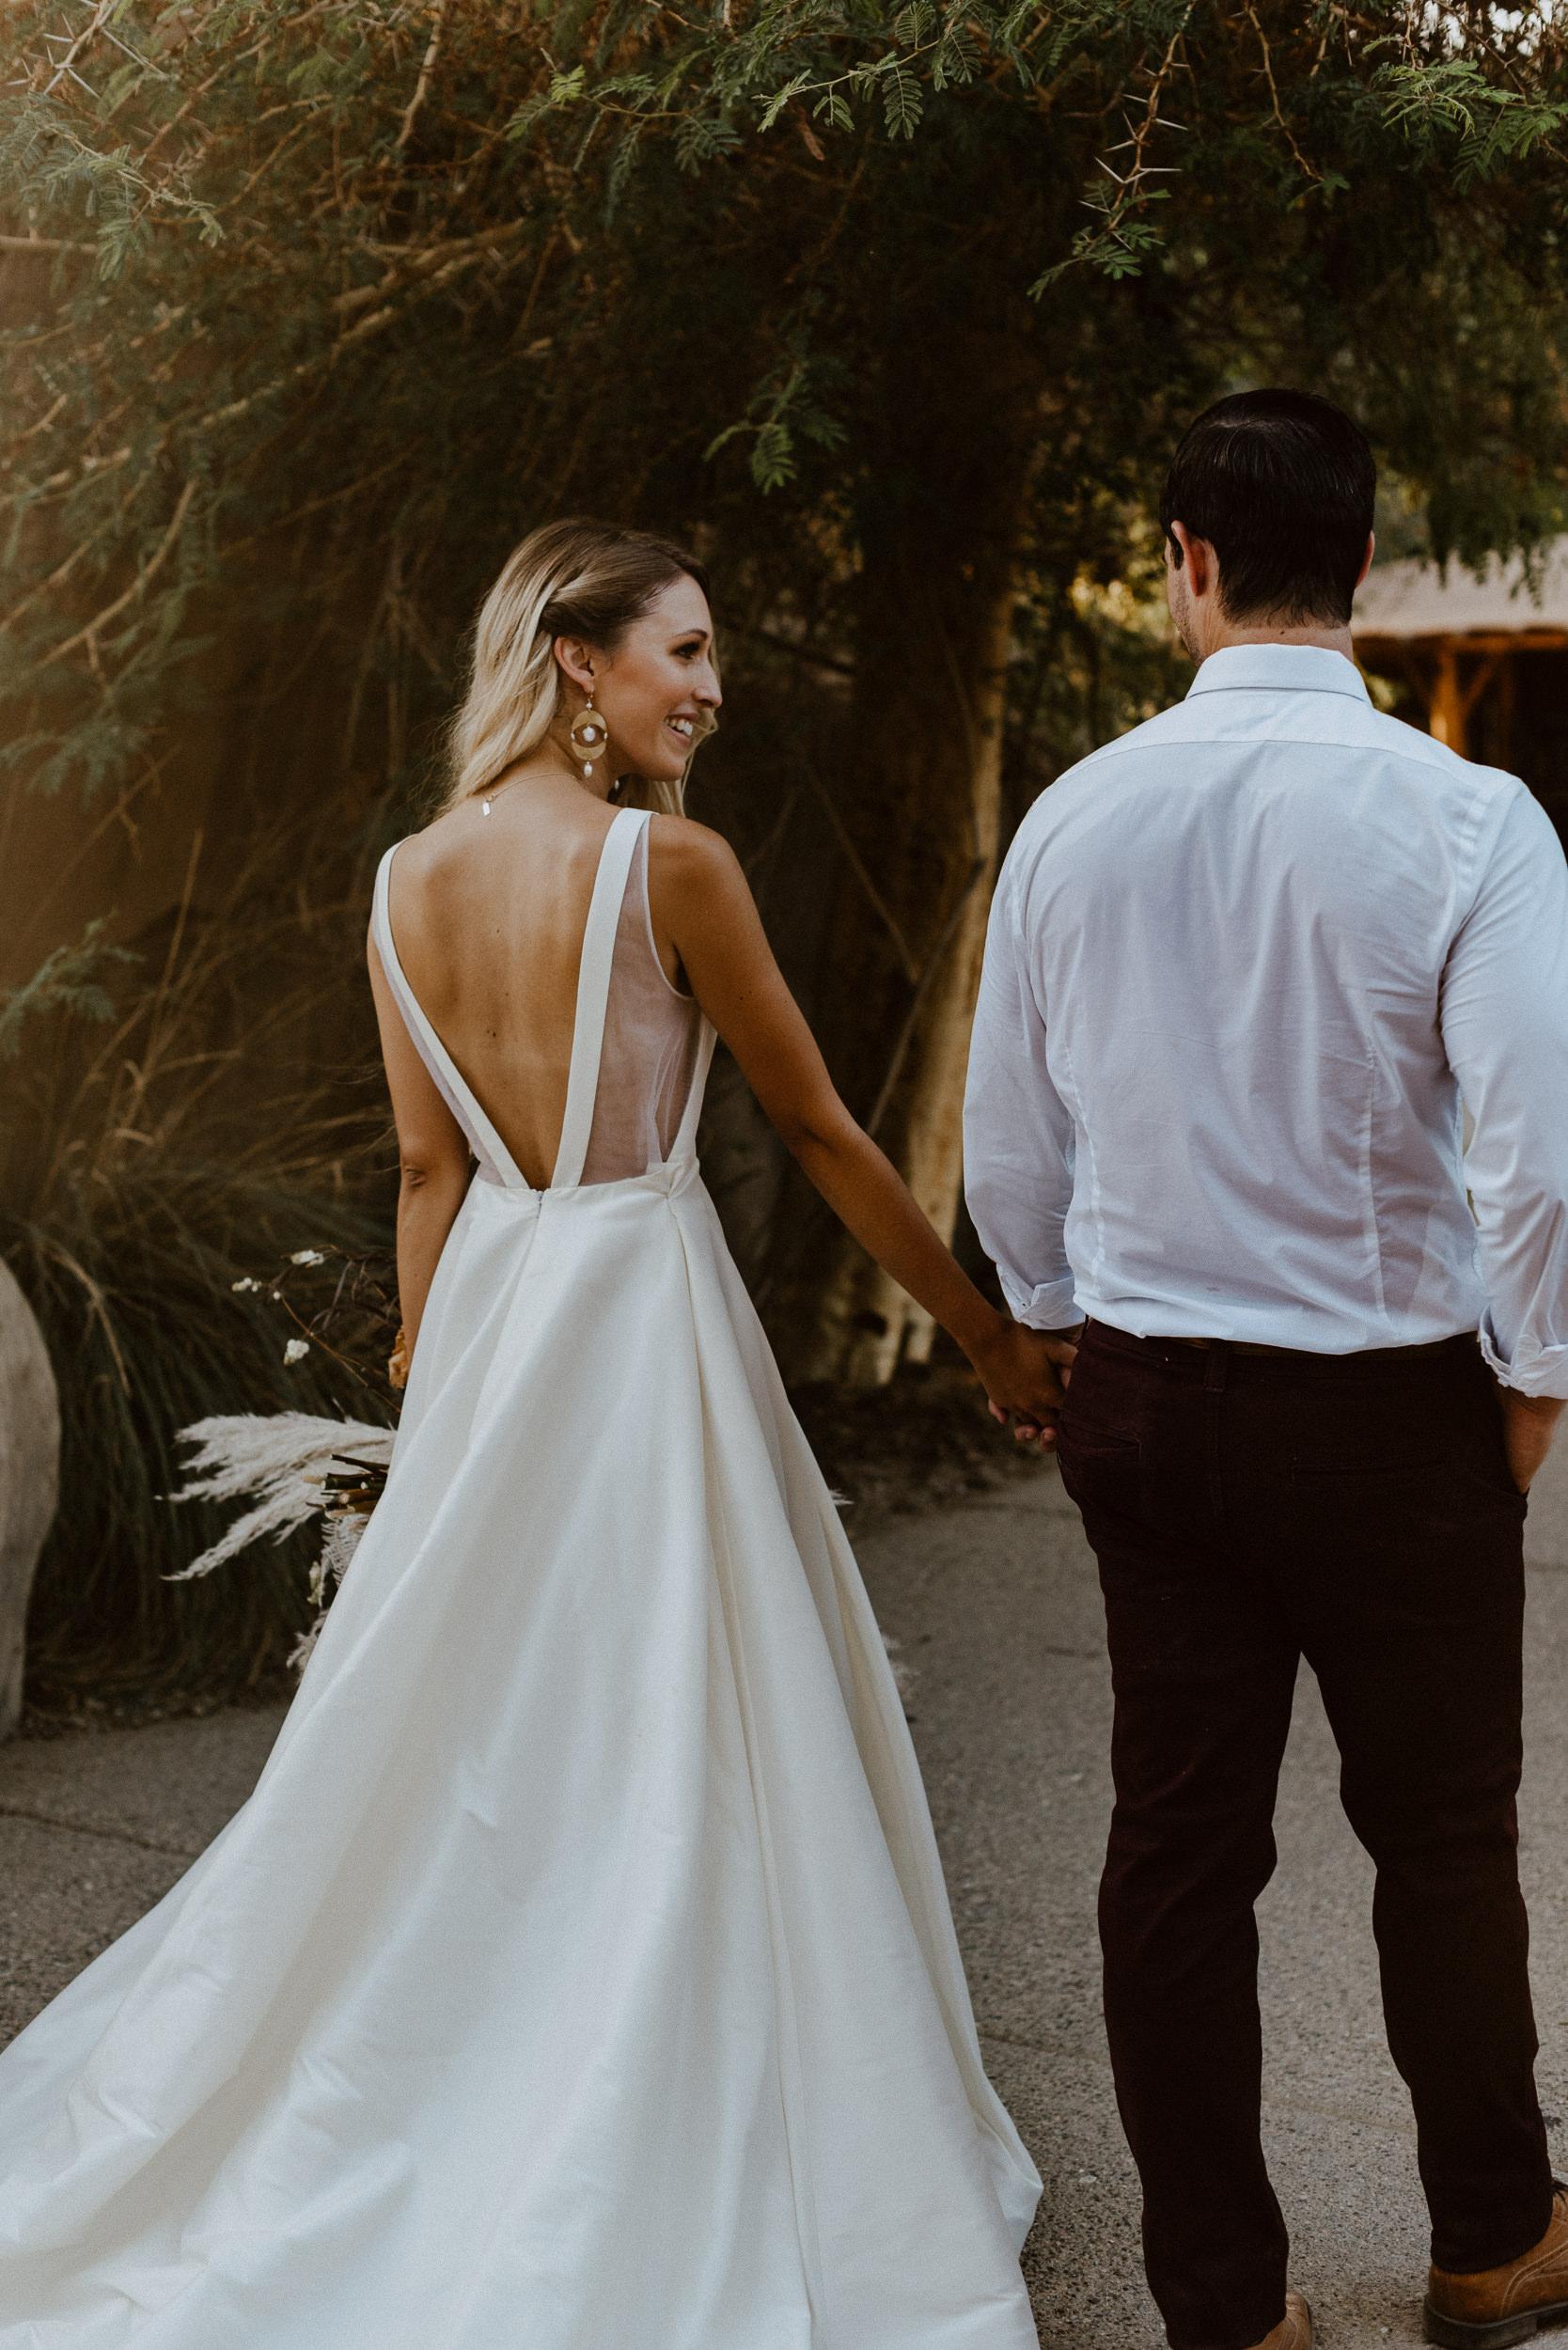 sChelsie + Chris - The Desert Shootout Wedding Romantics at The Living Desert-133.jpg